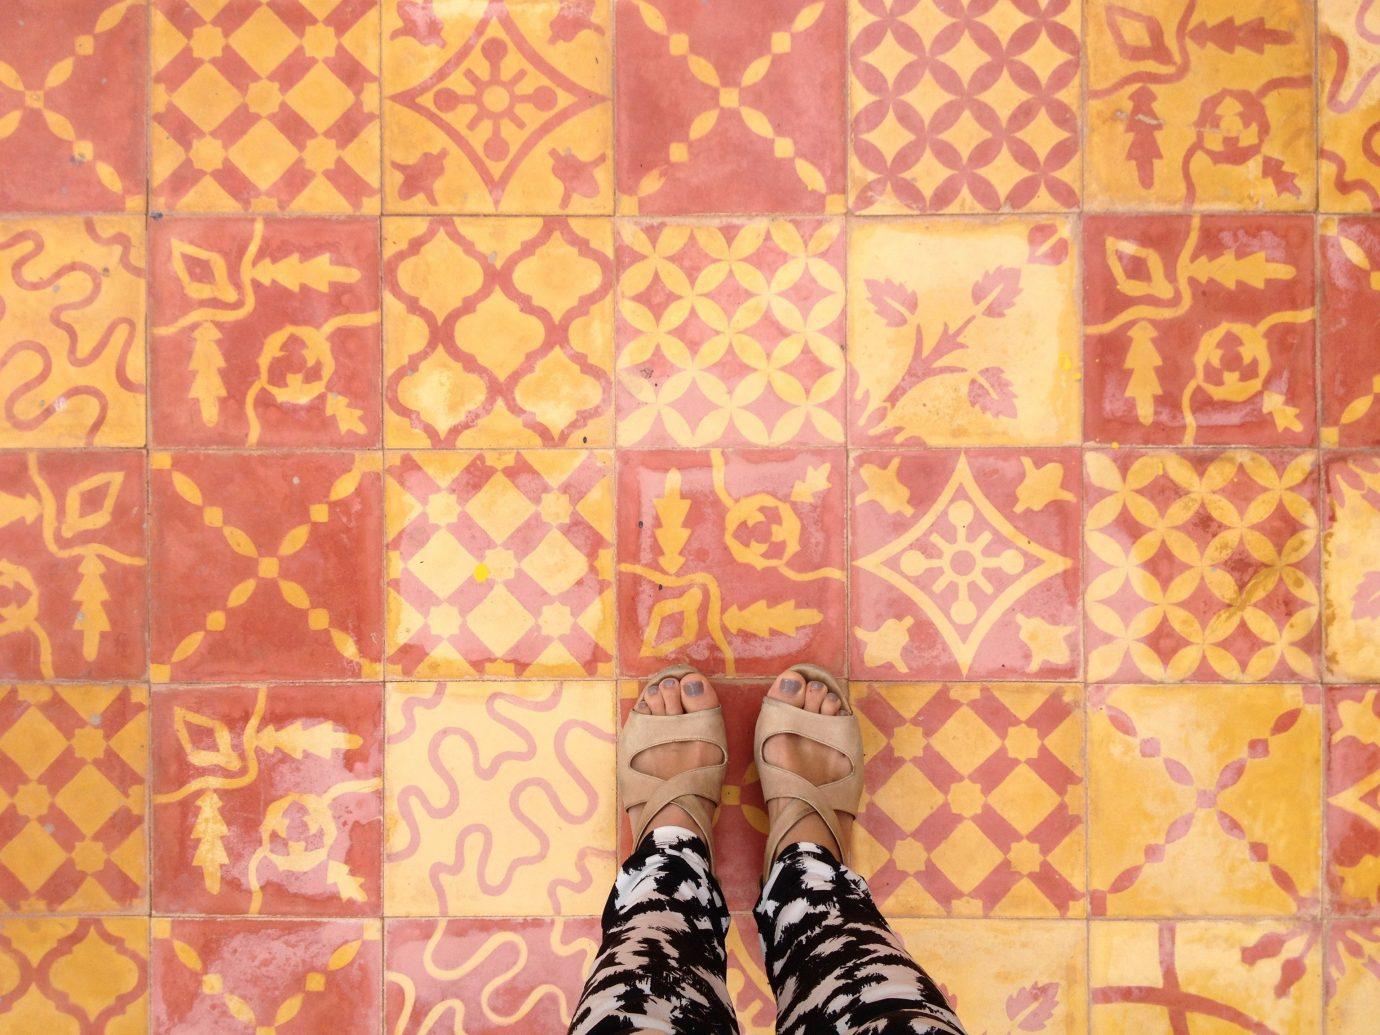 Trip Ideas wall pattern art Design yellow flooring modern art wallpaper illustration textile bedclothes orange fabric